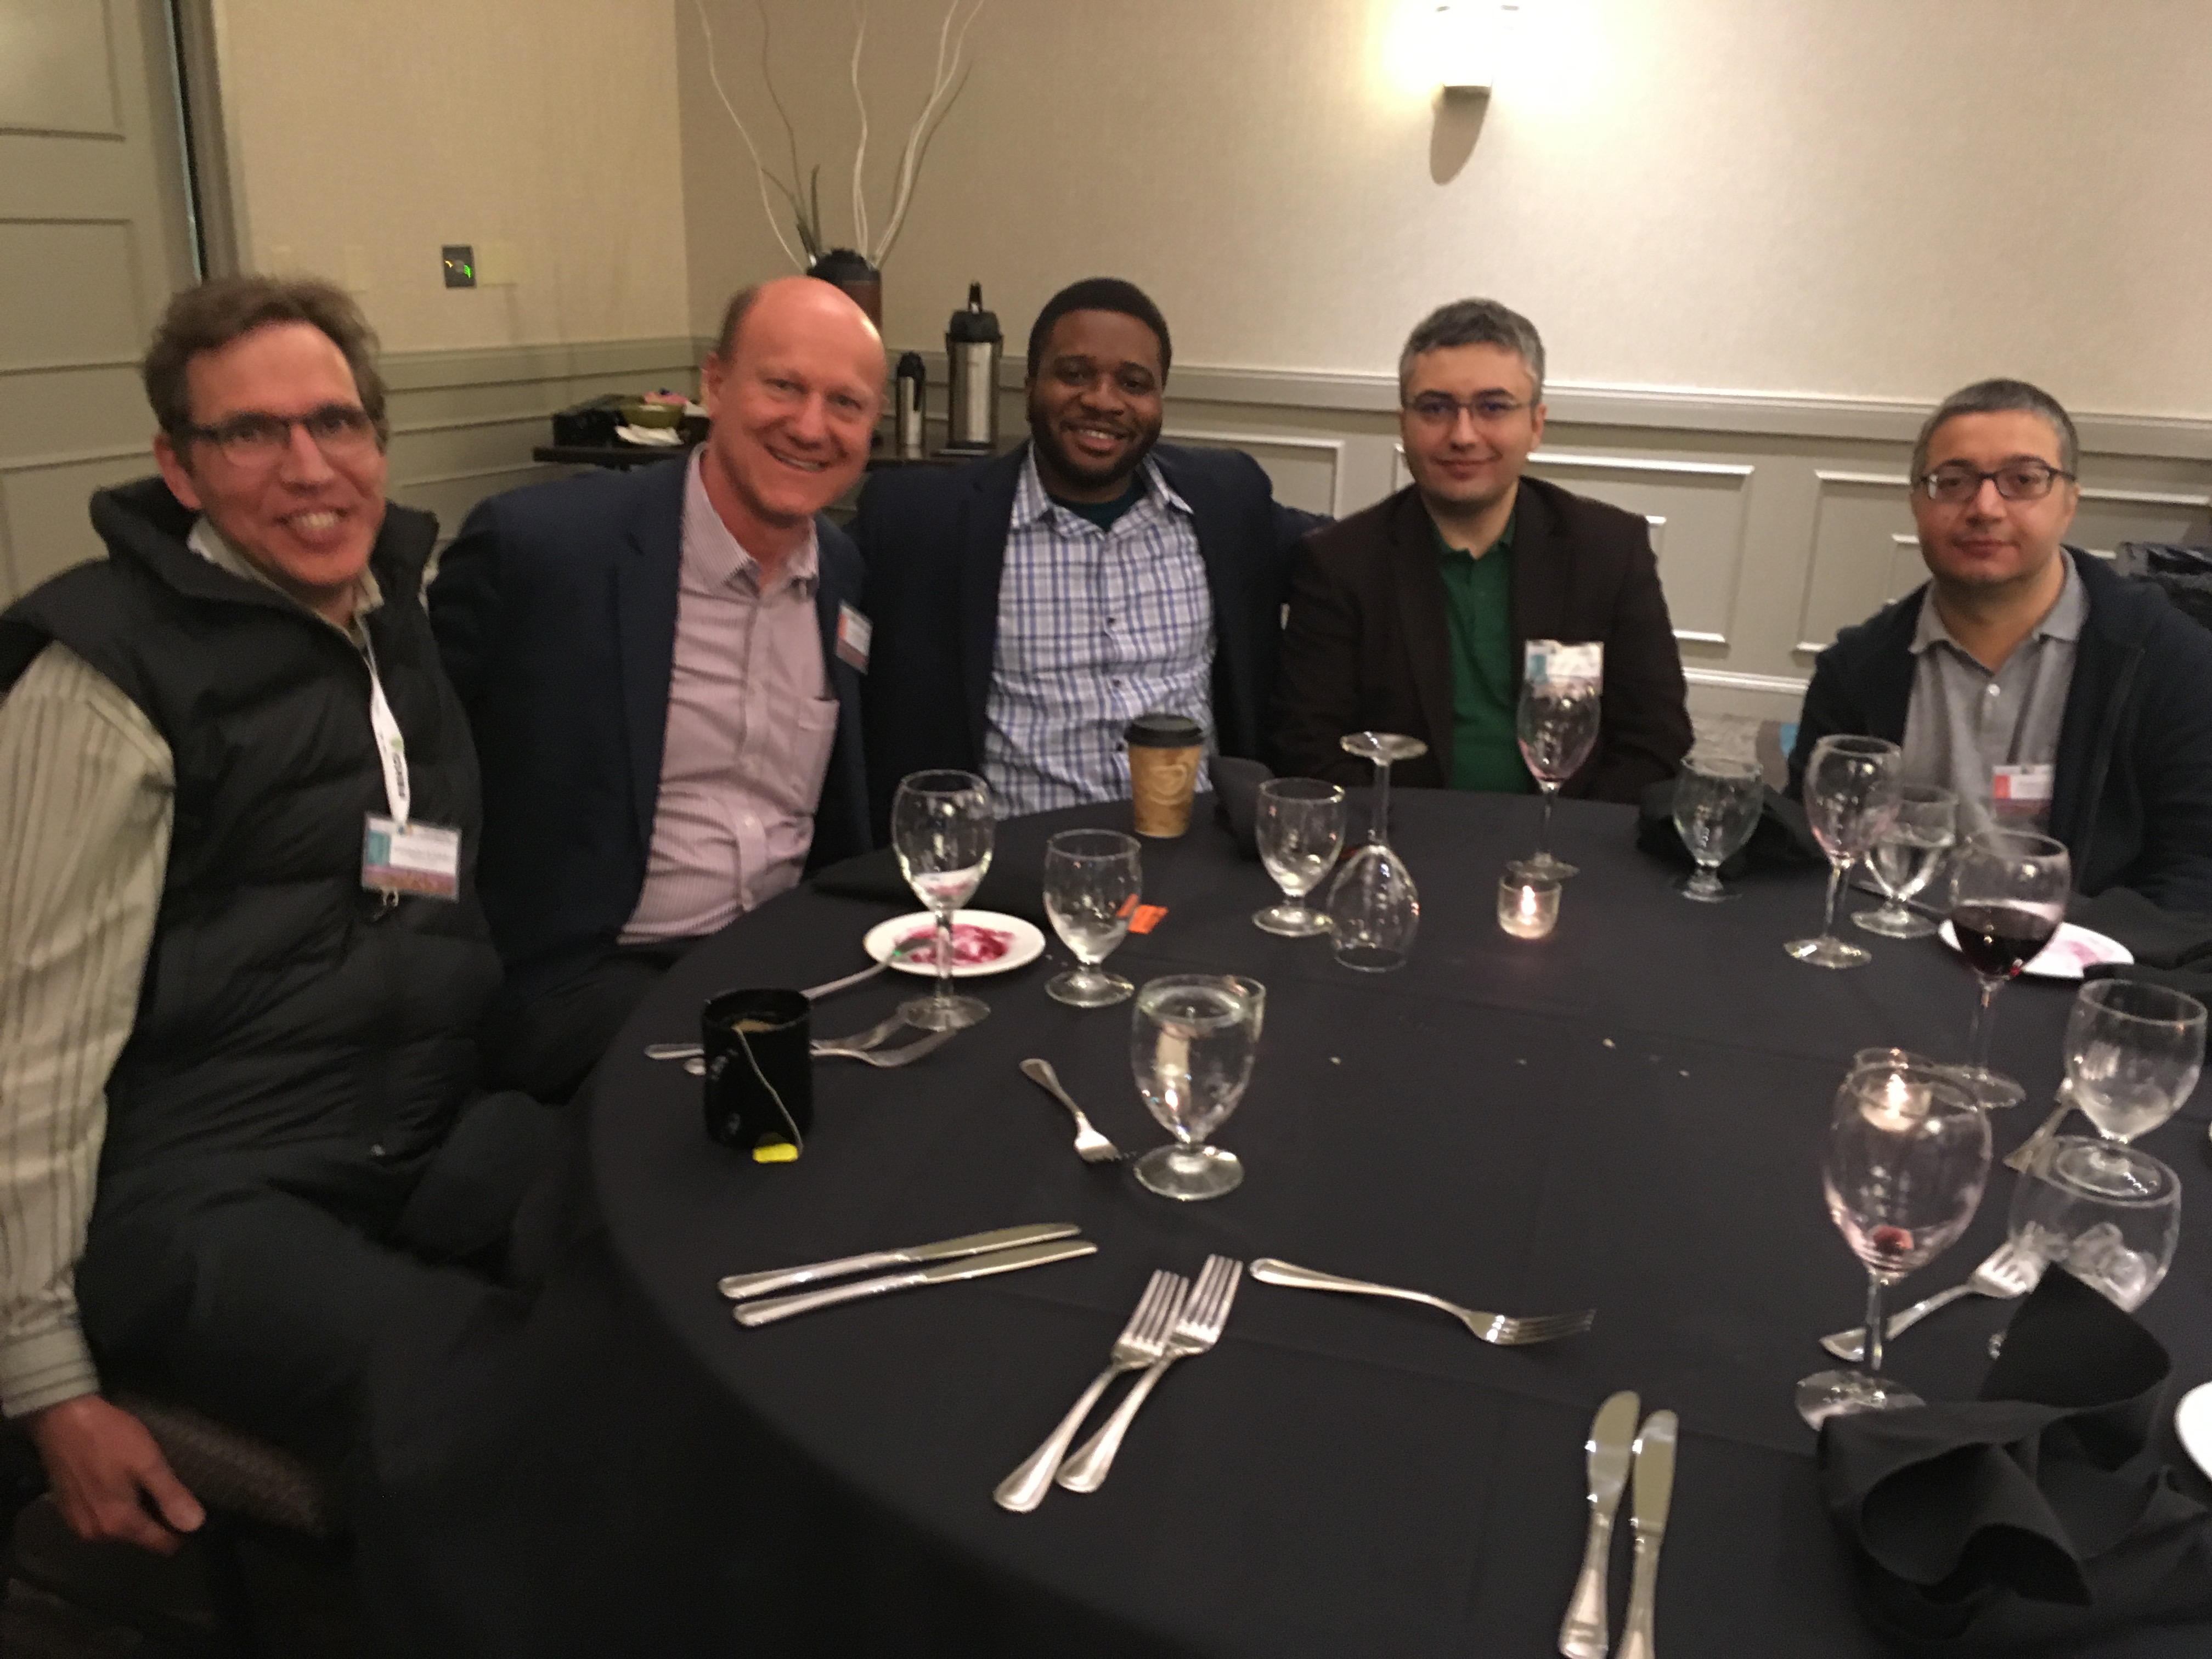 With Professor Olivier Martin and Professor Alex Kildishev at ACES 2018 Symposium